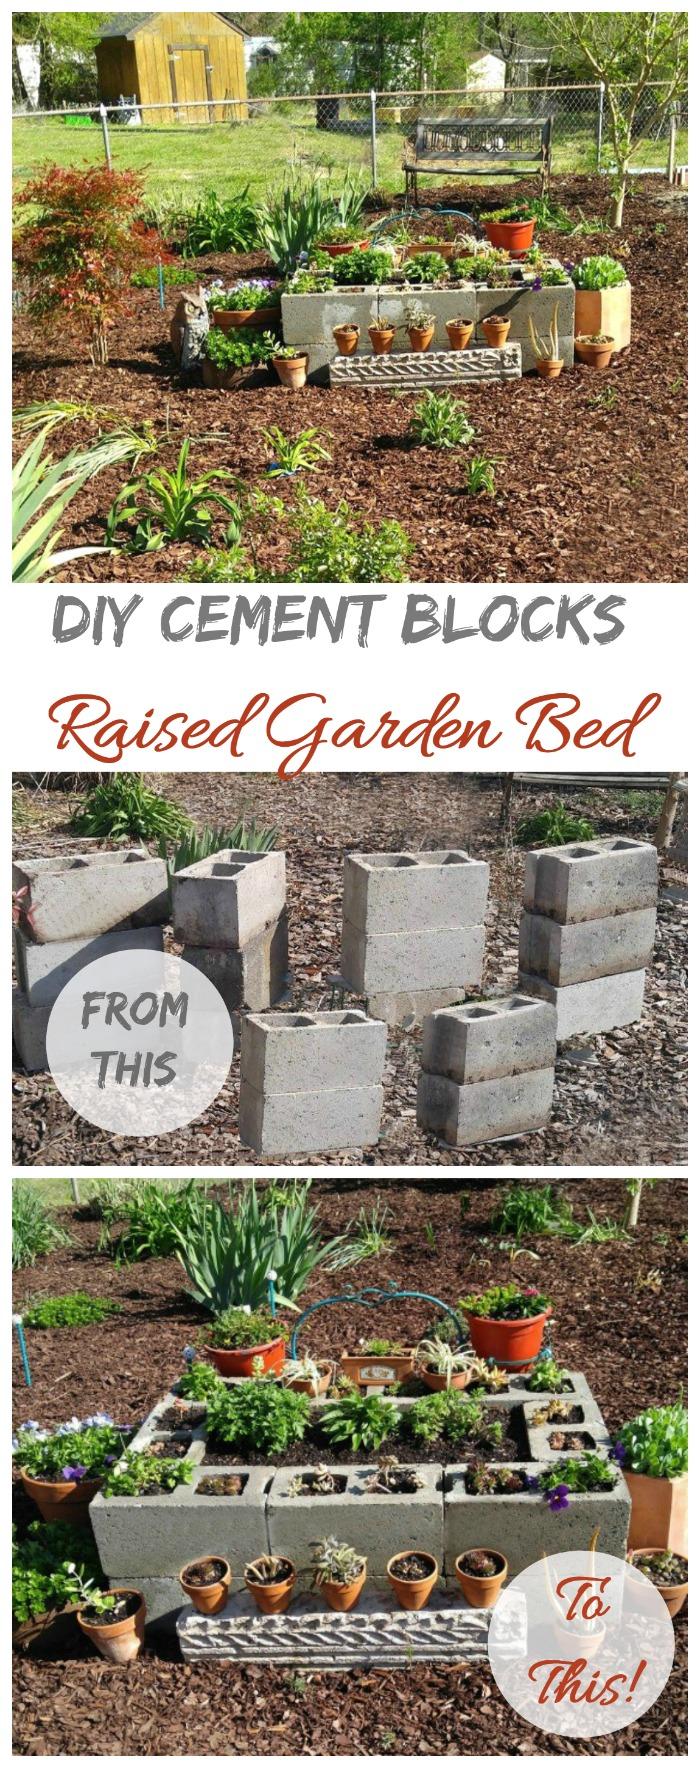 Decorative Blocks Raised Garden Bed